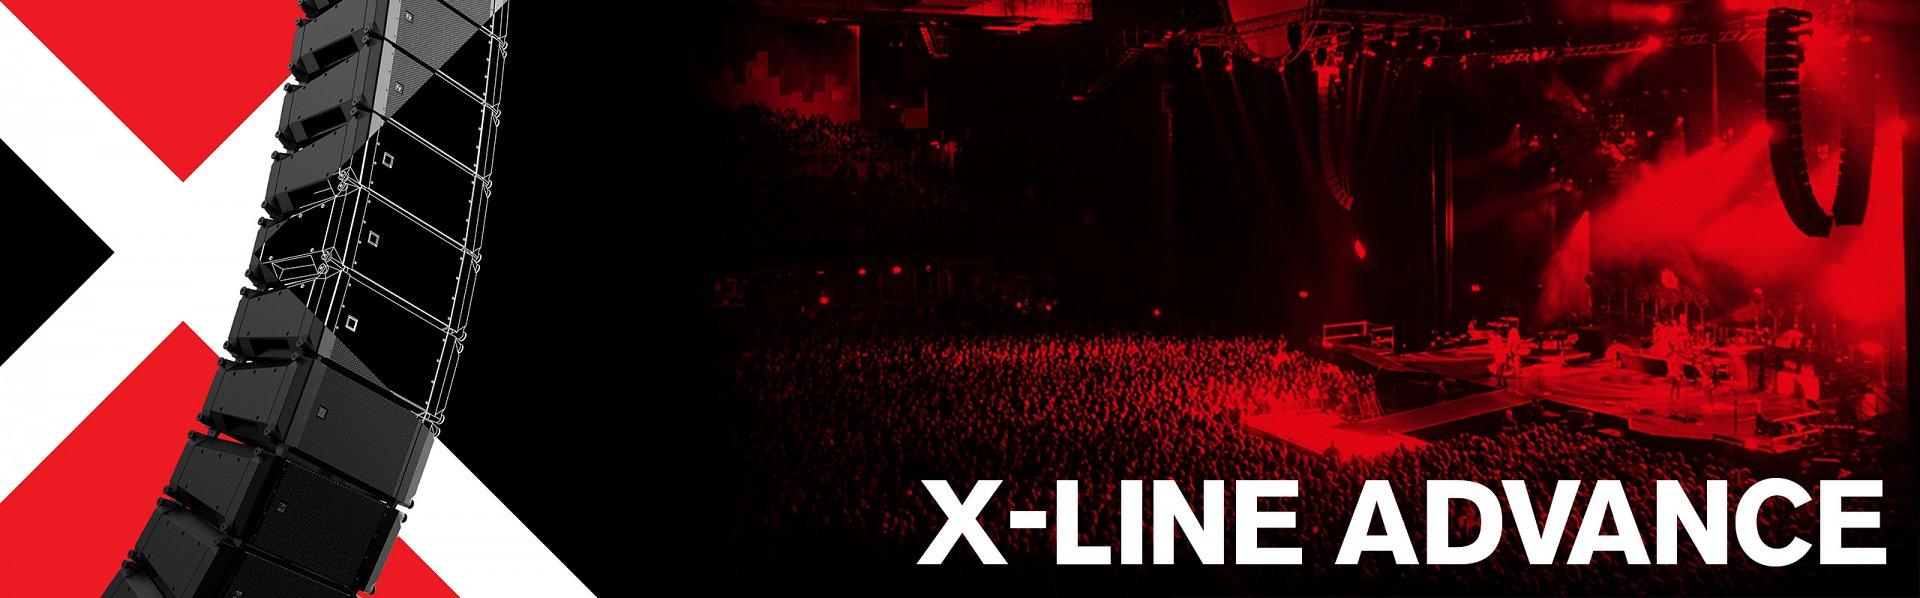 Loa Electro-voice X-Line Series